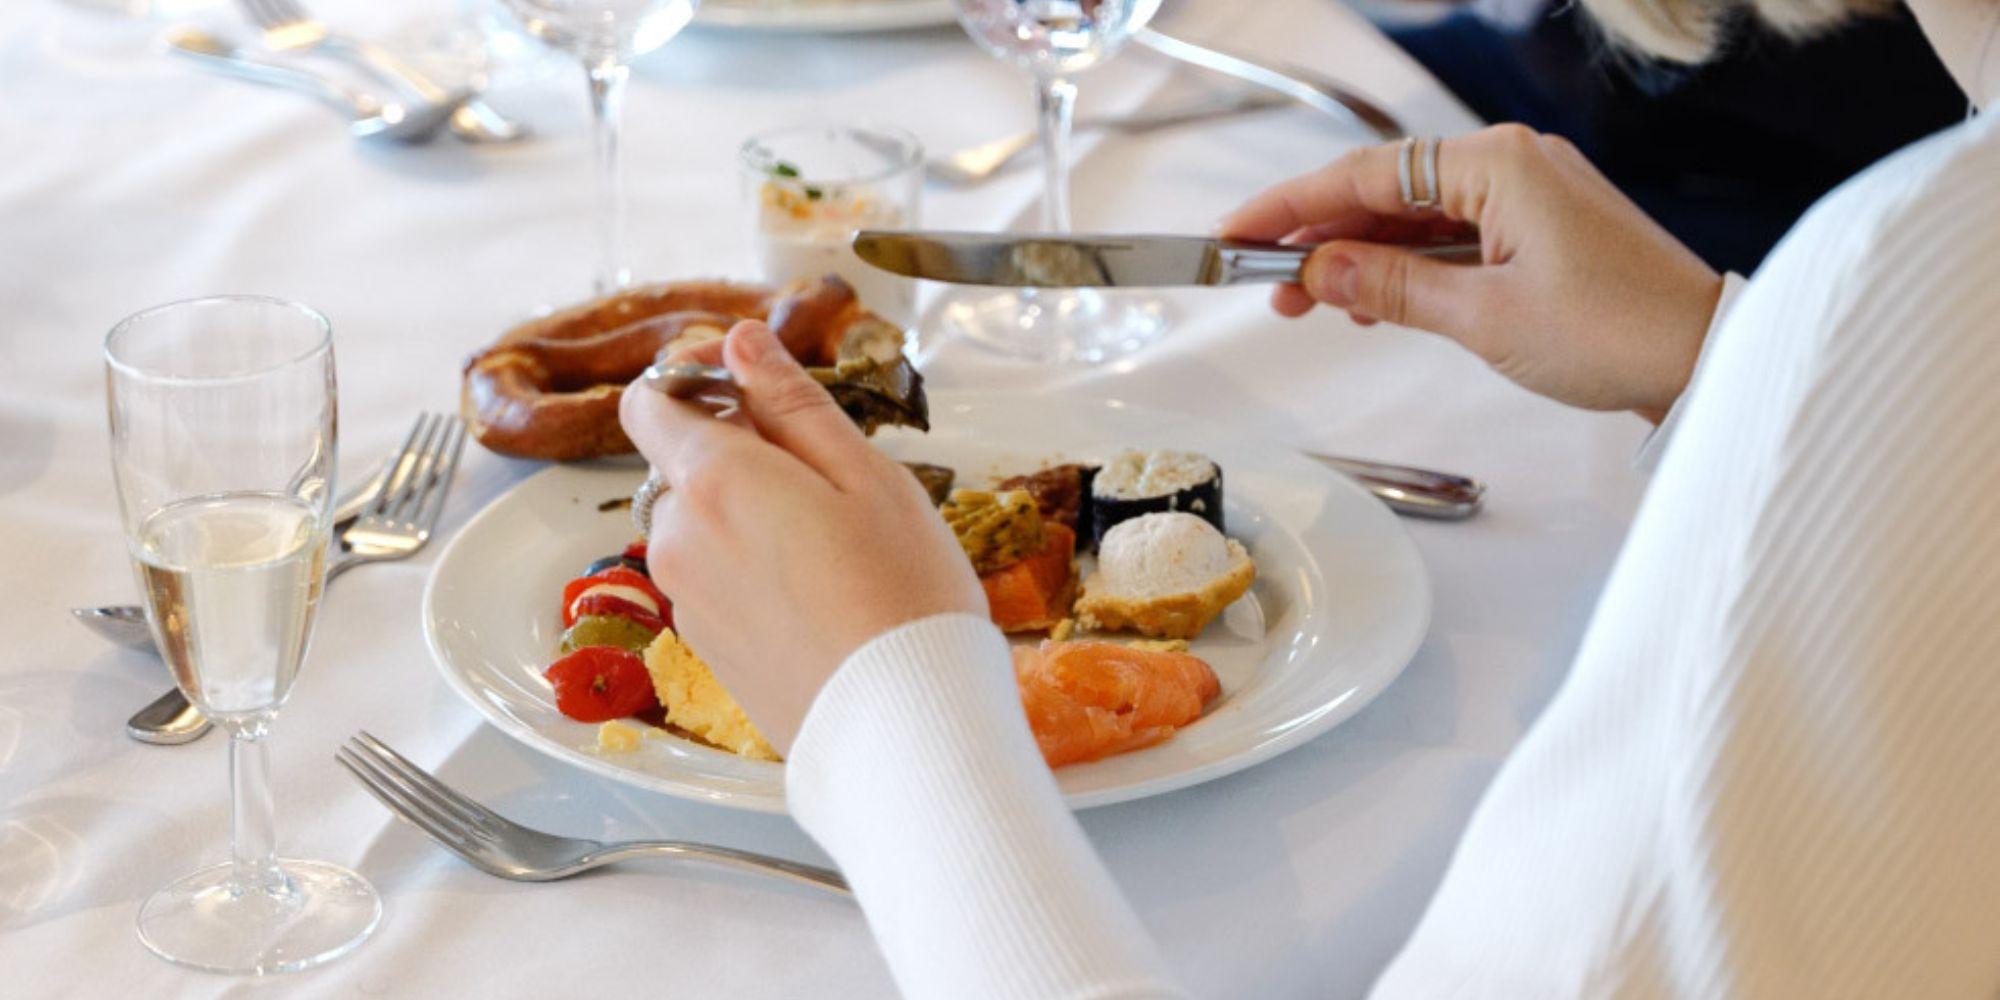 München Tivoli Restaurant - Hilton Munich Park brunch